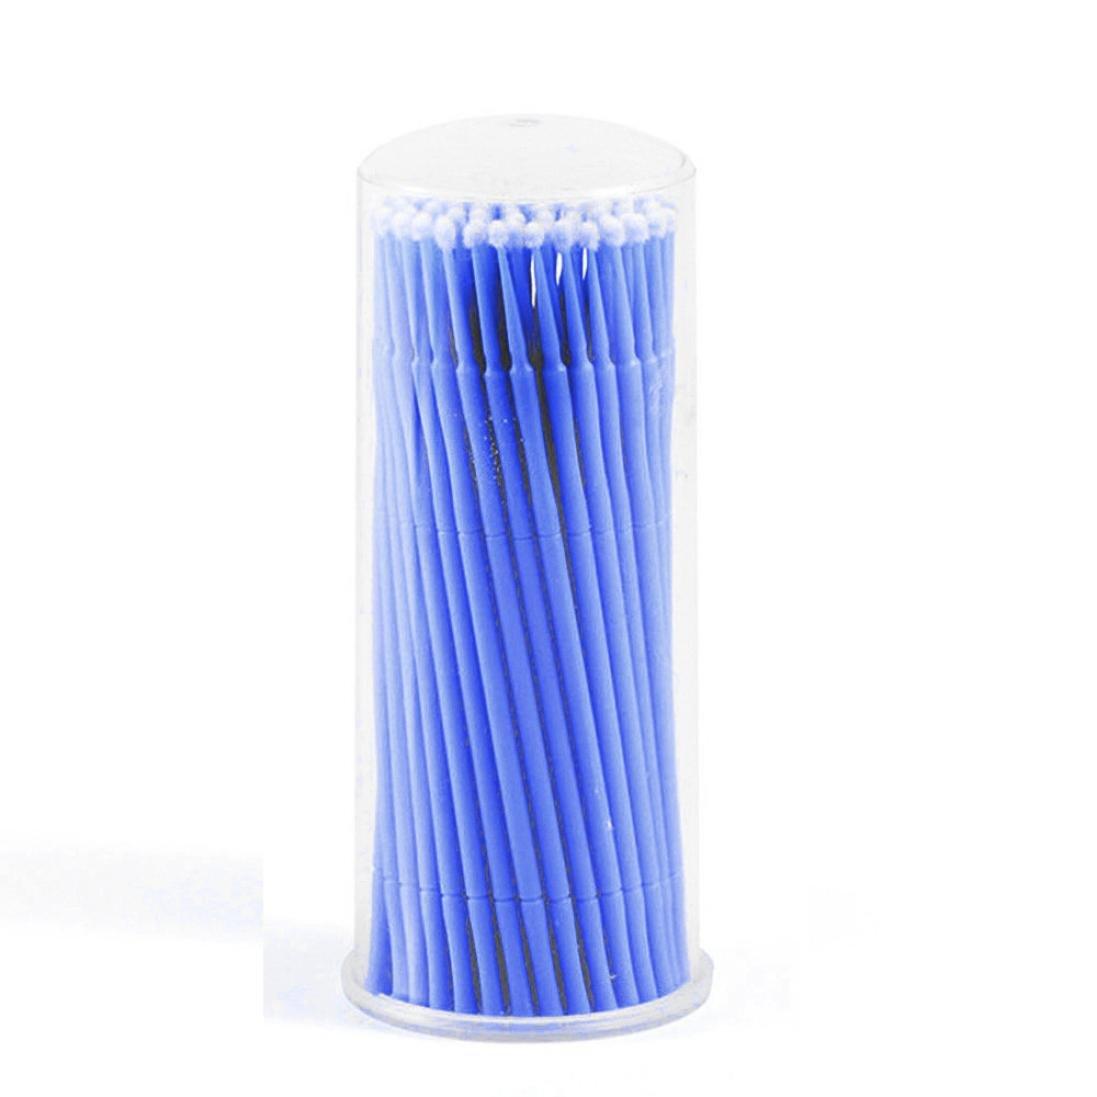 DZT1968 100Pc/Bottle Microblading Micro Brushes Swab Lint Free Tattoo Permanent Supplies (Purple)